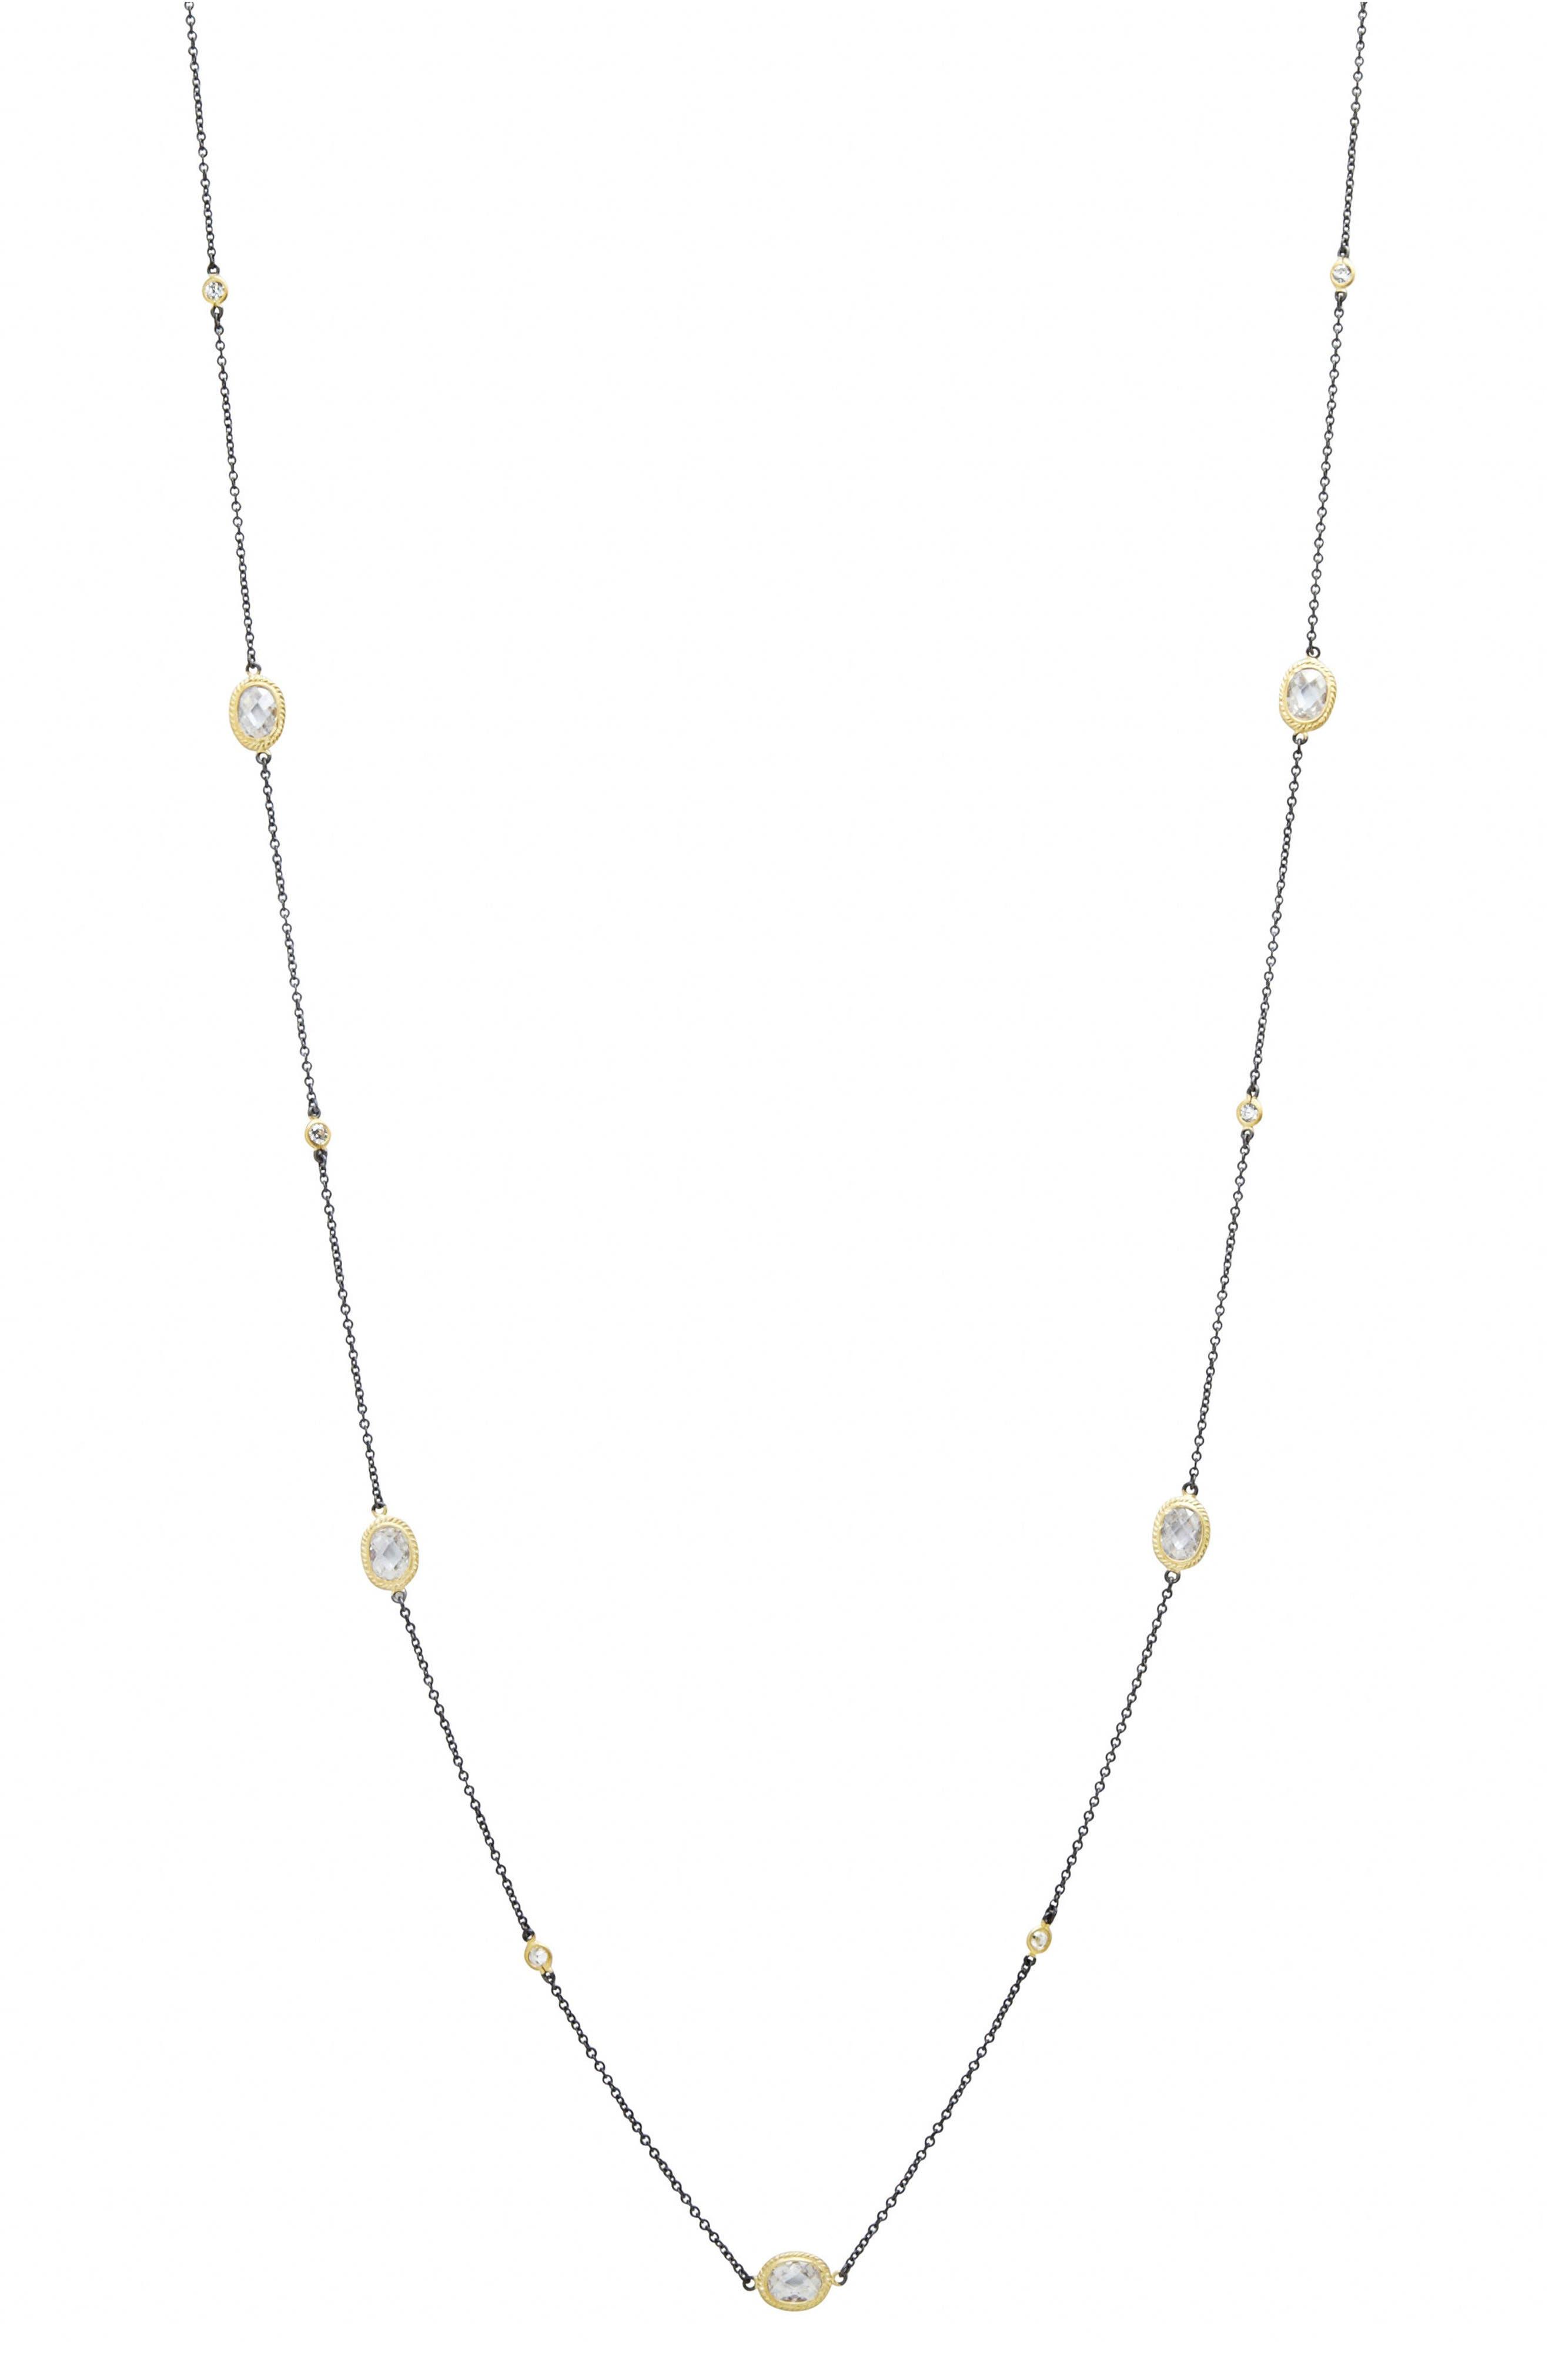 Signature Radiance Wrap Necklace,                             Alternate thumbnail 2, color,                             GOLD/ BLACK